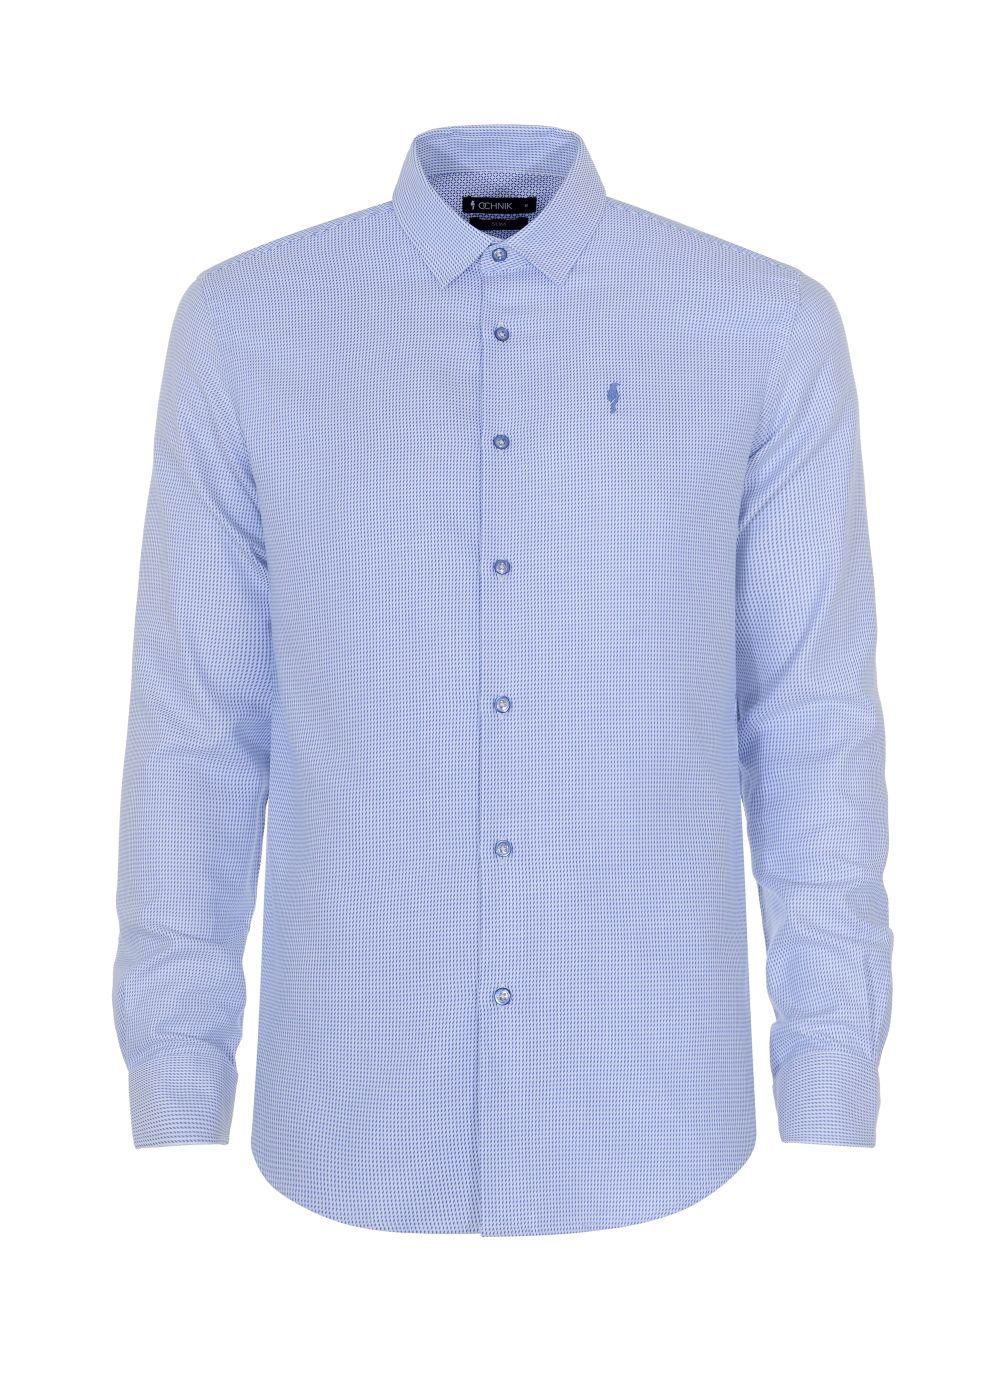 Koszula męska KOSMT-0160-11(Z21)